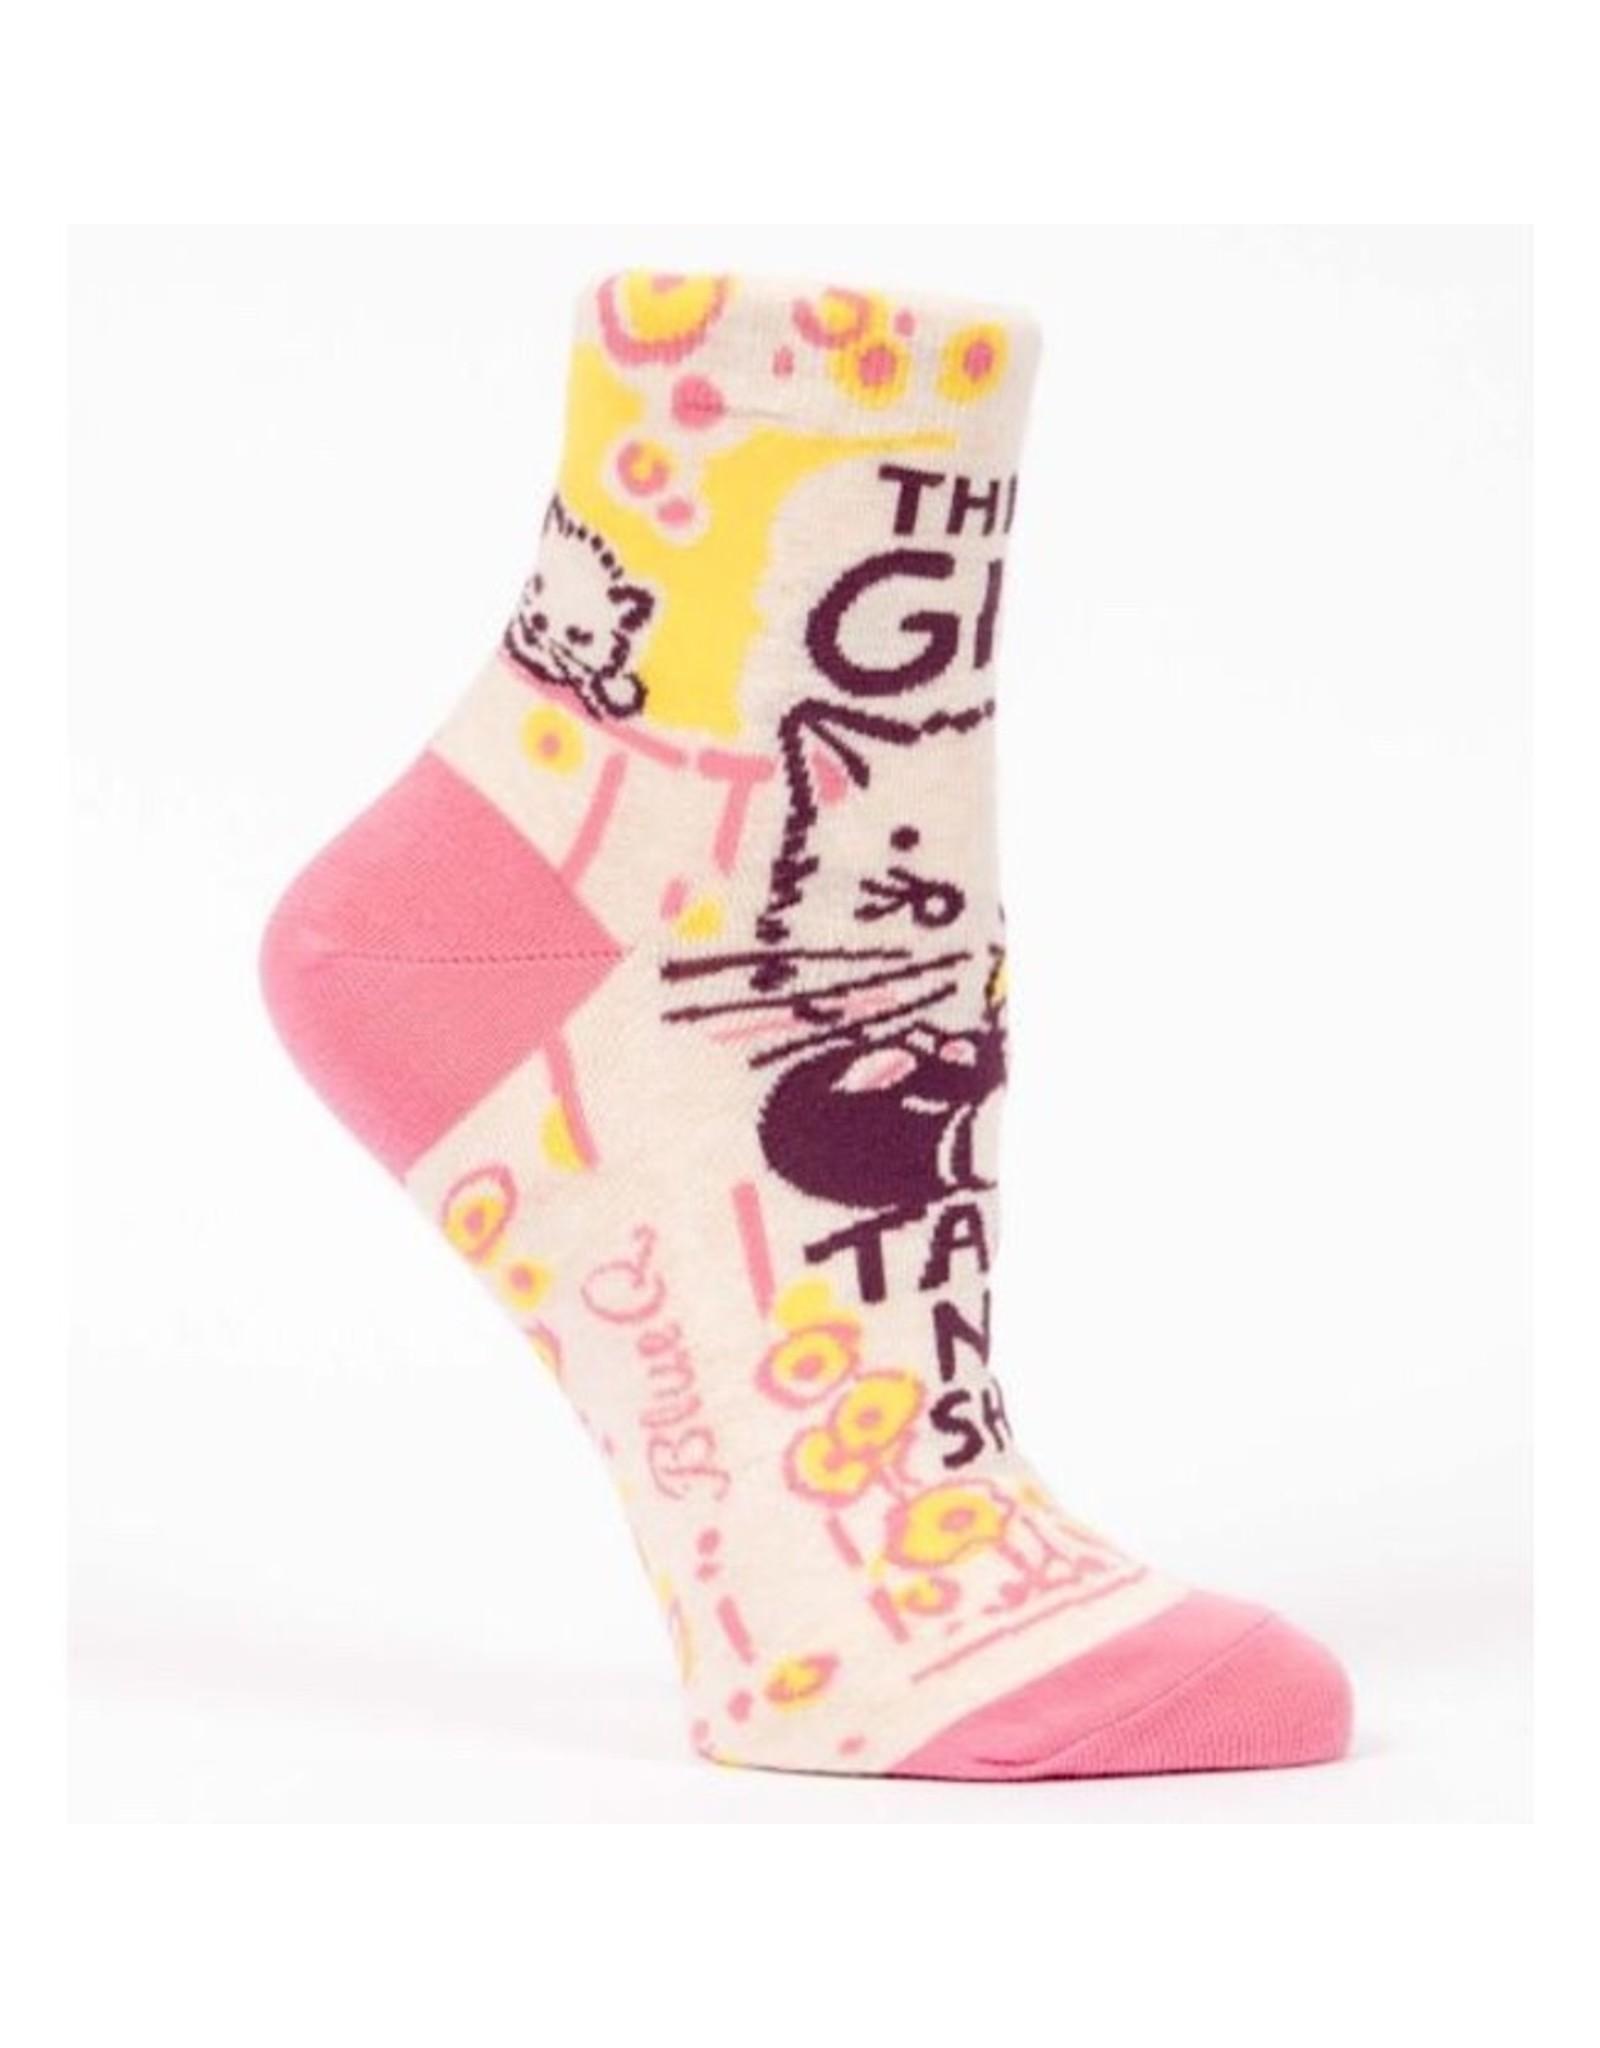 Socks (Womens) (Ankle) - Girl Takes No Shit